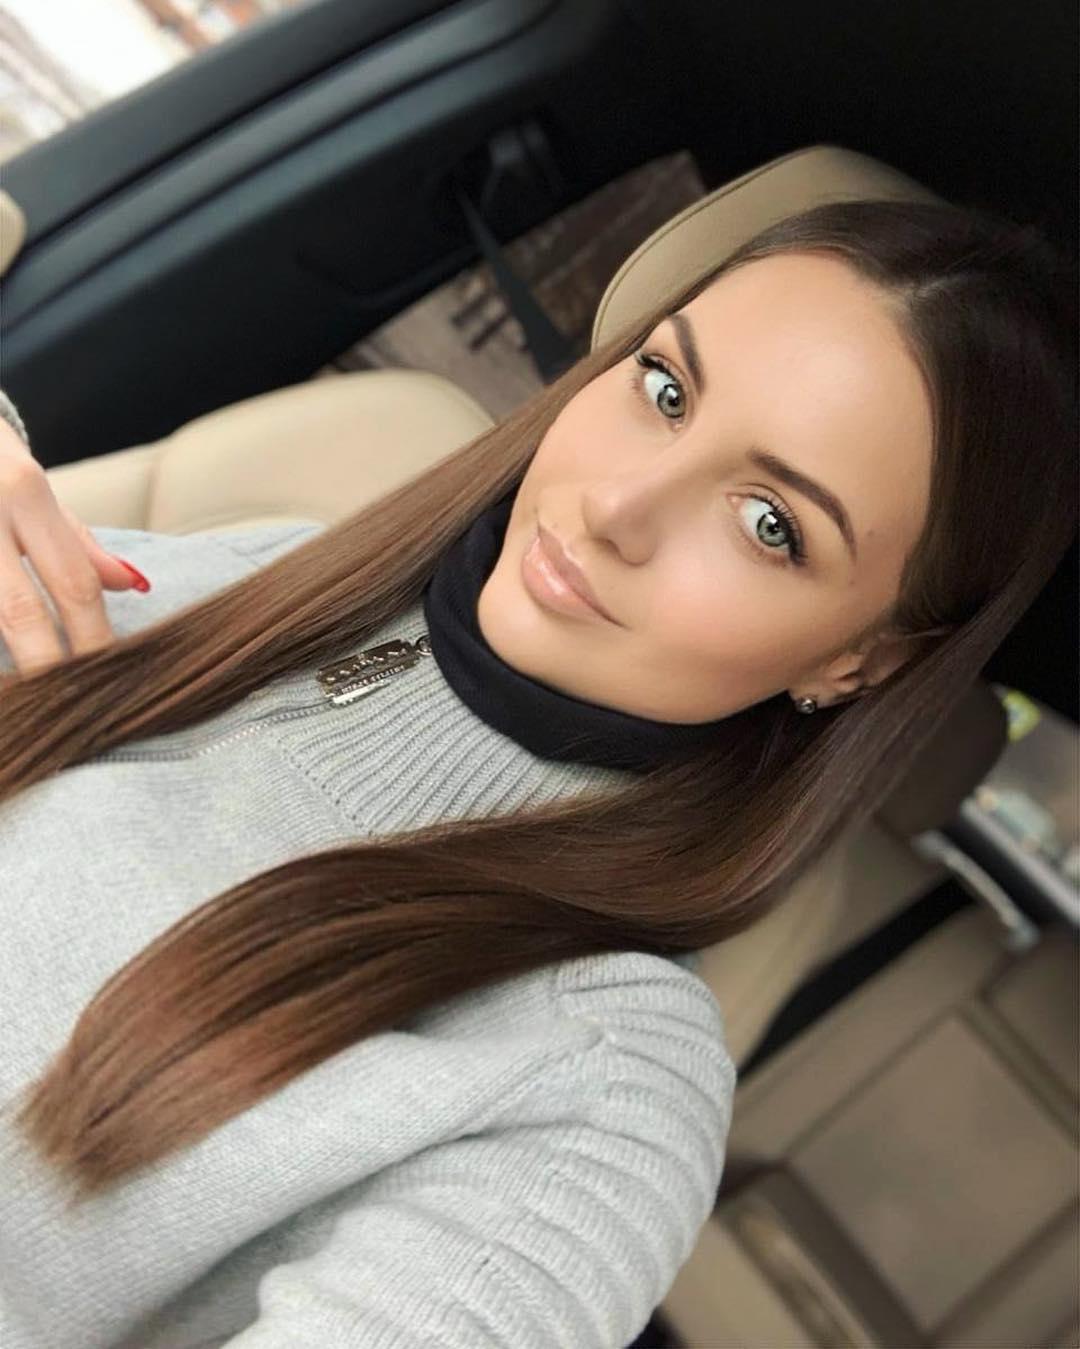 Alena-Gogoleva-Wallpapers-Insta-Fit-Bio-6